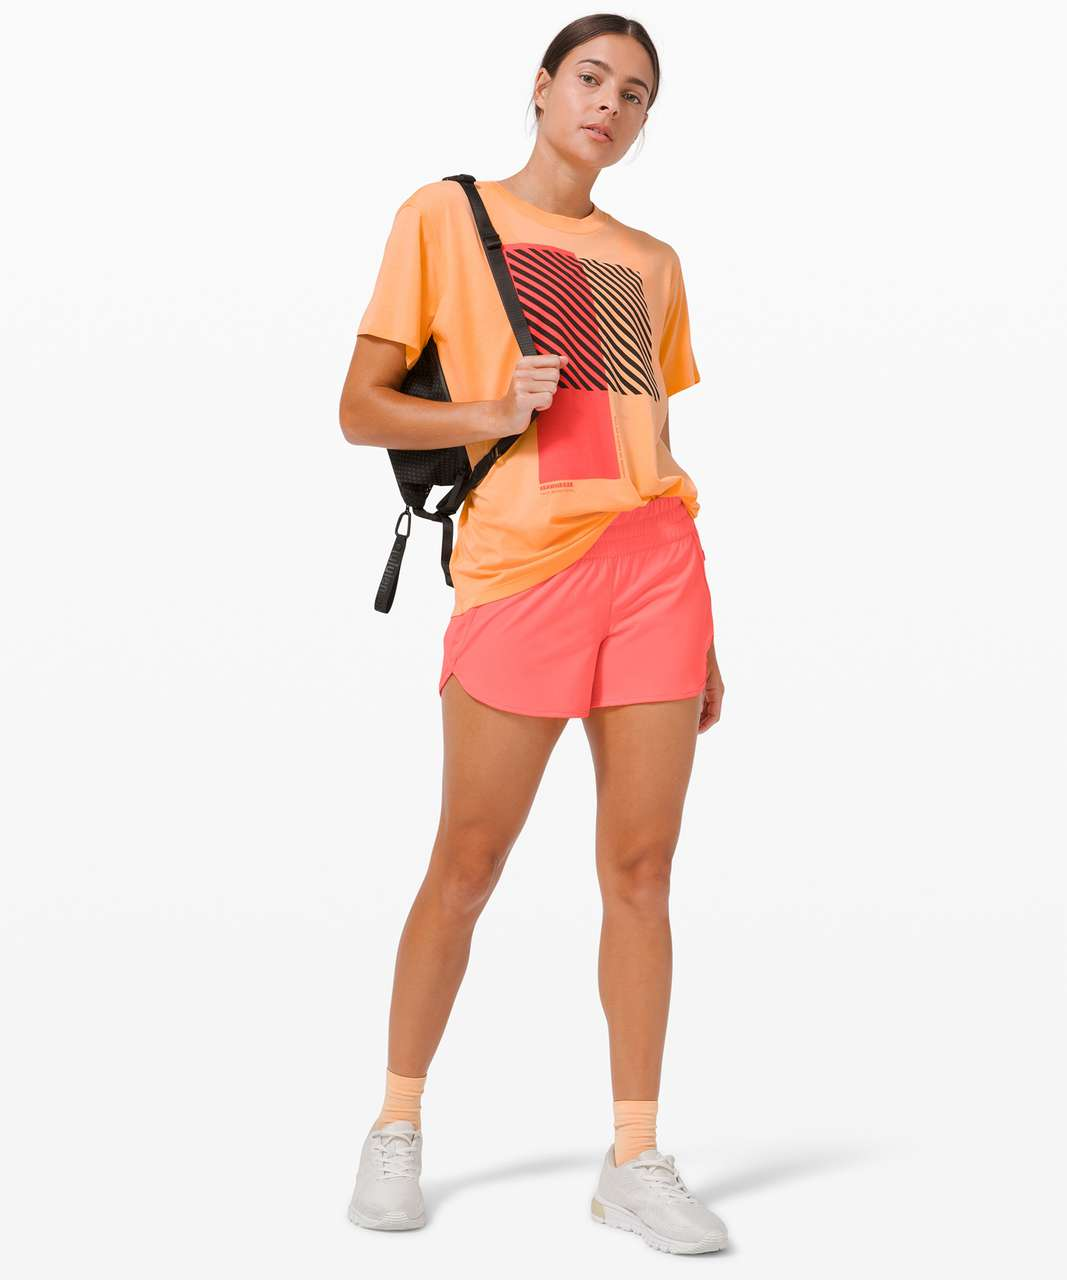 Lululemon All Yours Tee *SeaWheeze - Florid Orange